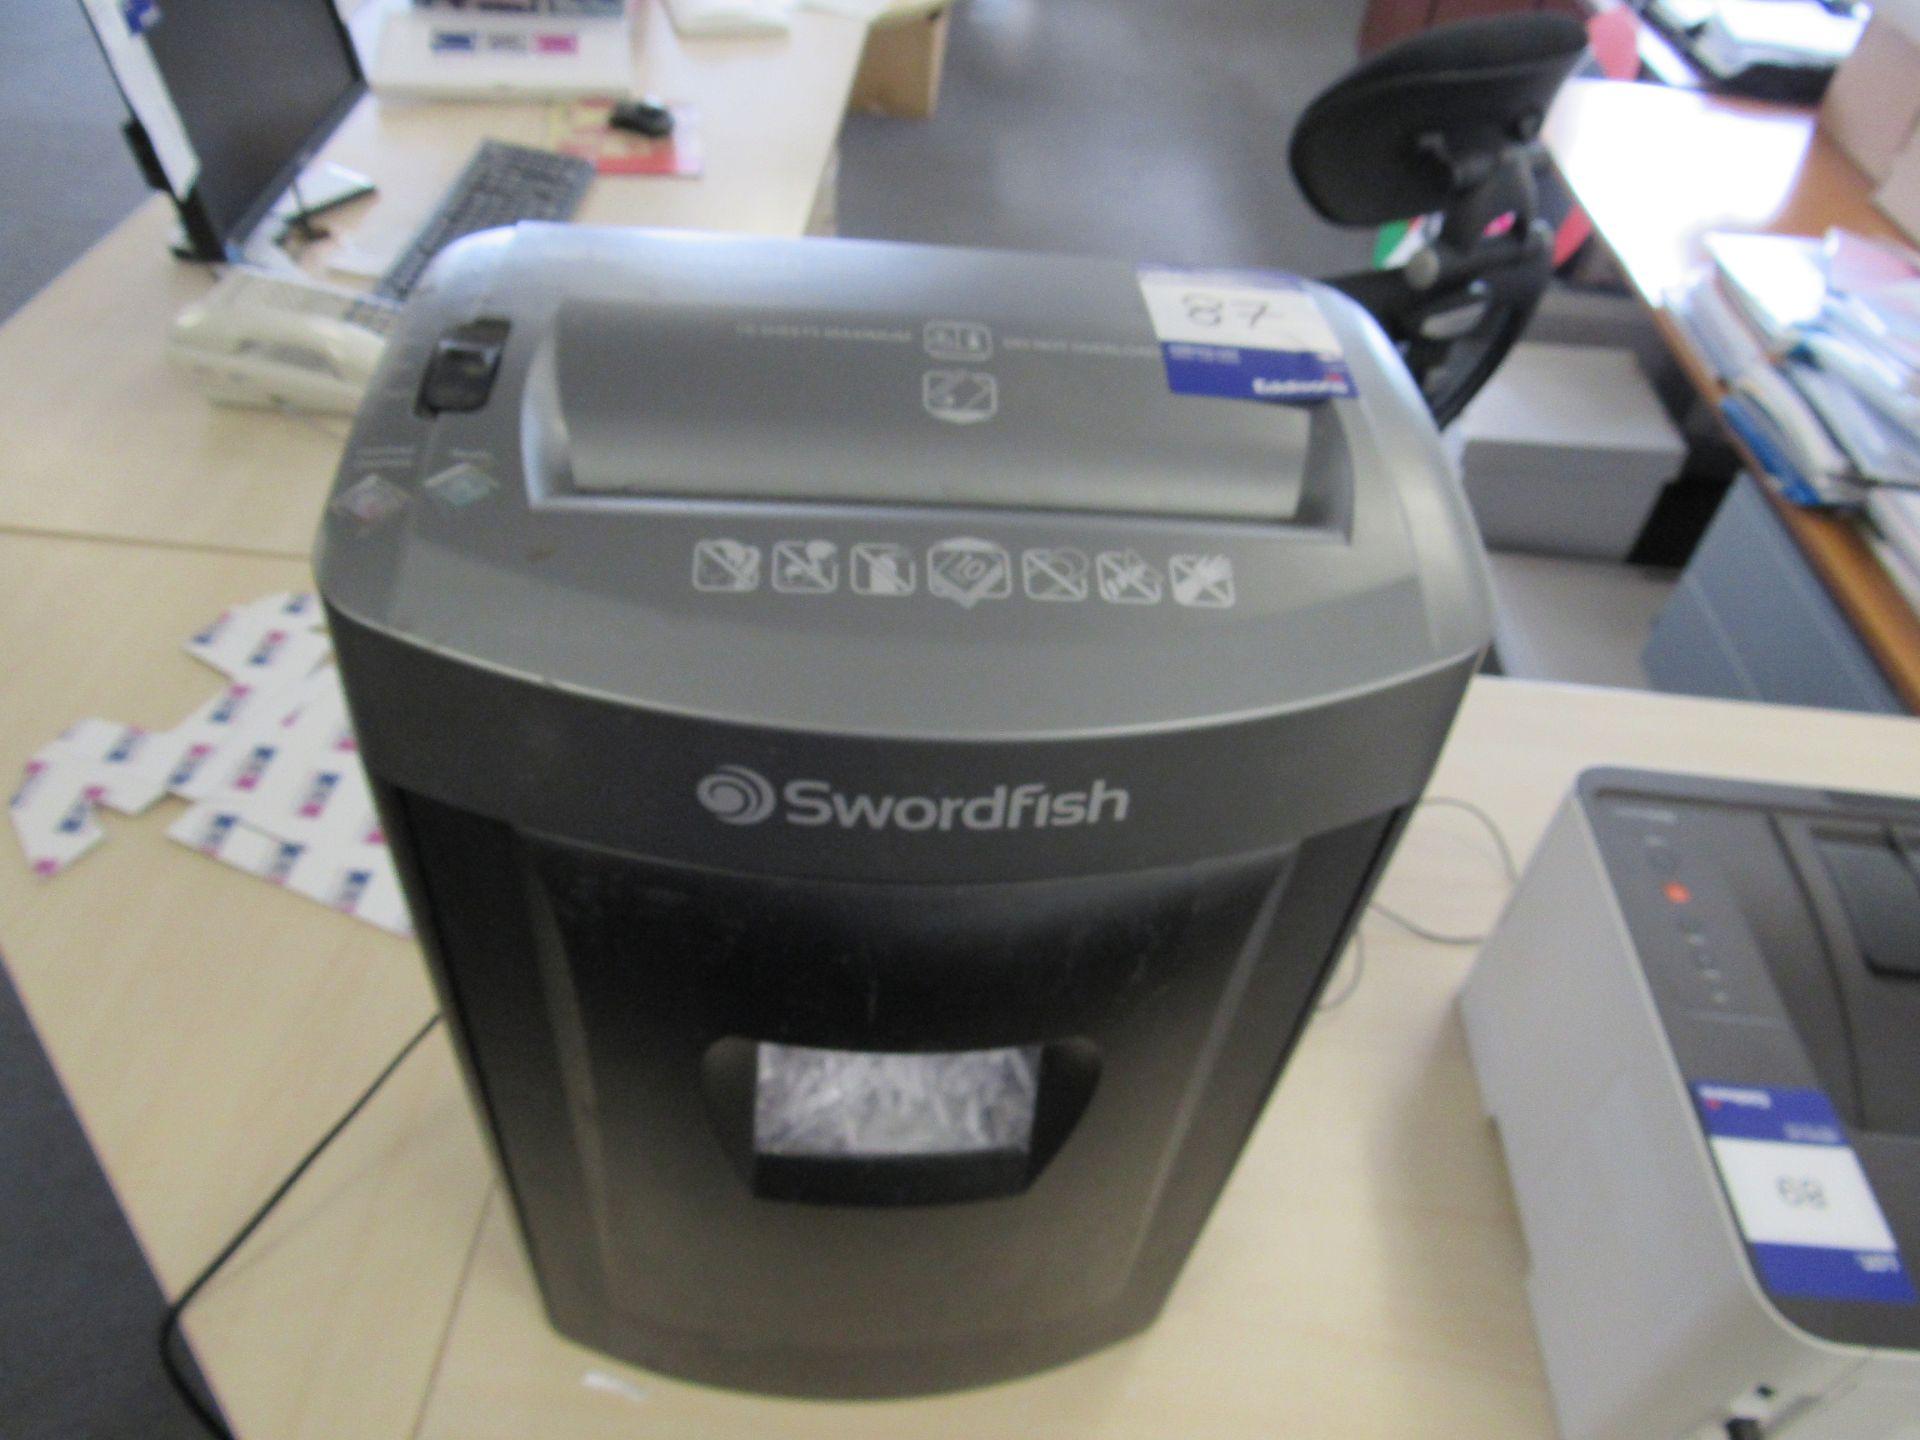 Dymo LabelWriter 320, Swordfish Cross Cut 100 XC shredder, and HP LaserJet 1320 Printer - Image 2 of 3